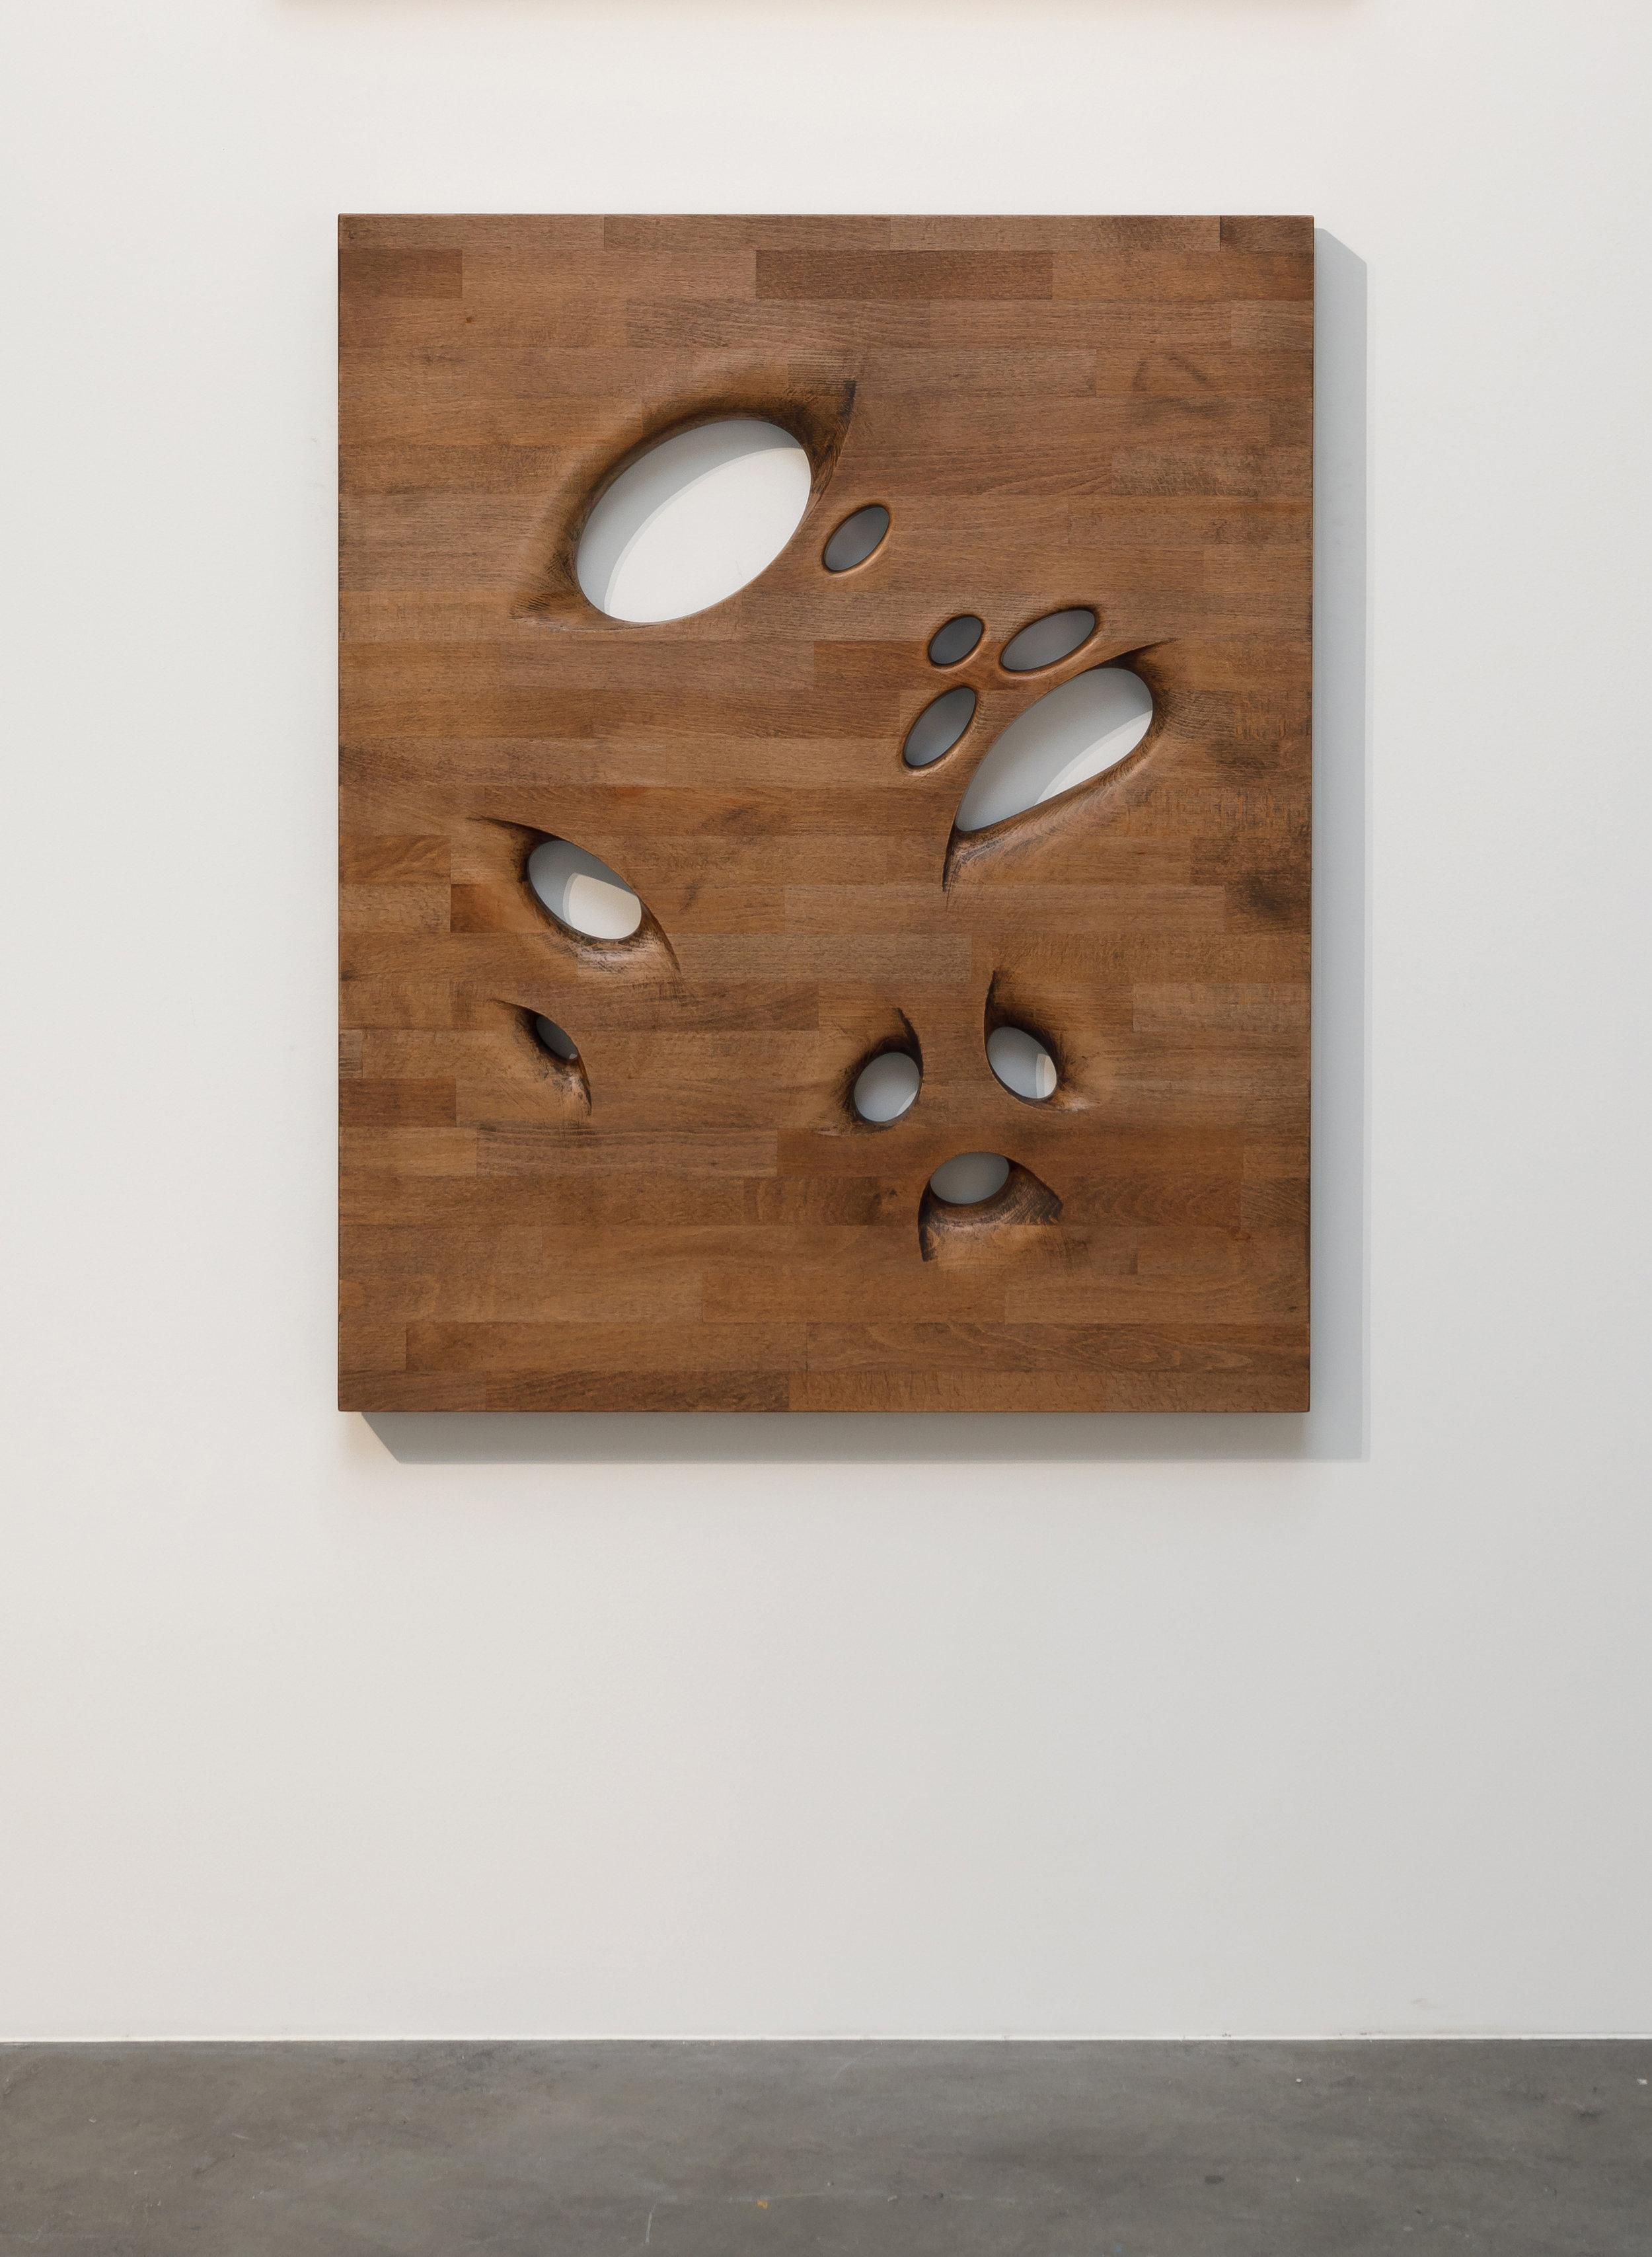 Richard Nikl, Assistant, 2017,Beech Wood, Hard Wax Oil, Aluminium Hardware,100 x 82 x 5 cm